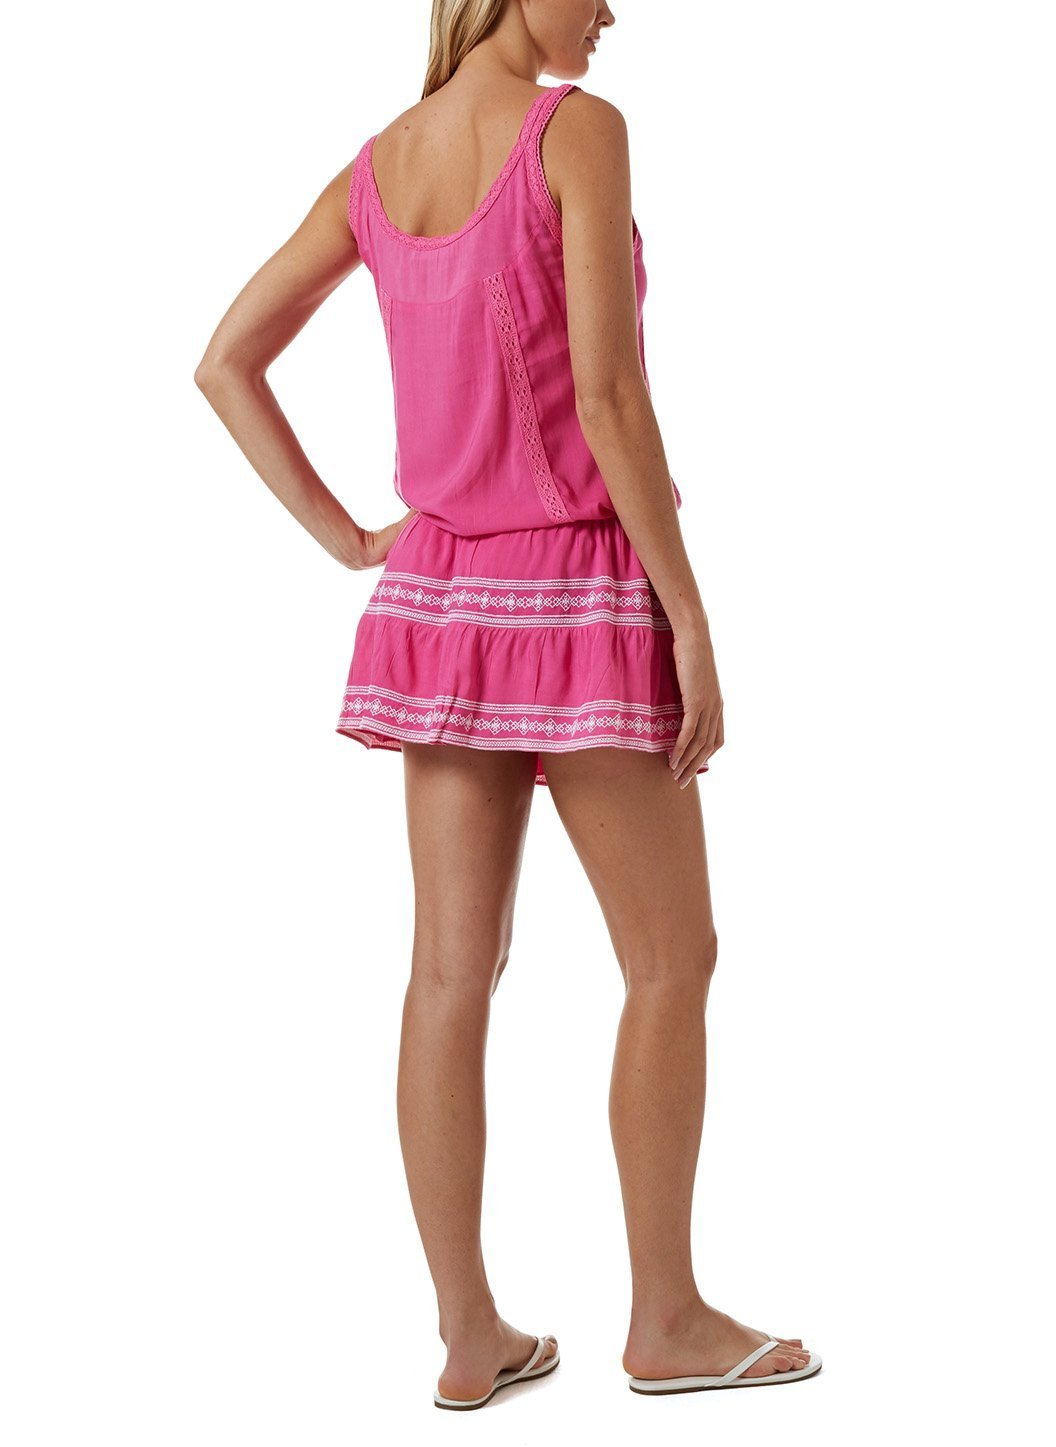 Jaz_Flamingo_Dress_B_1056x.progressive